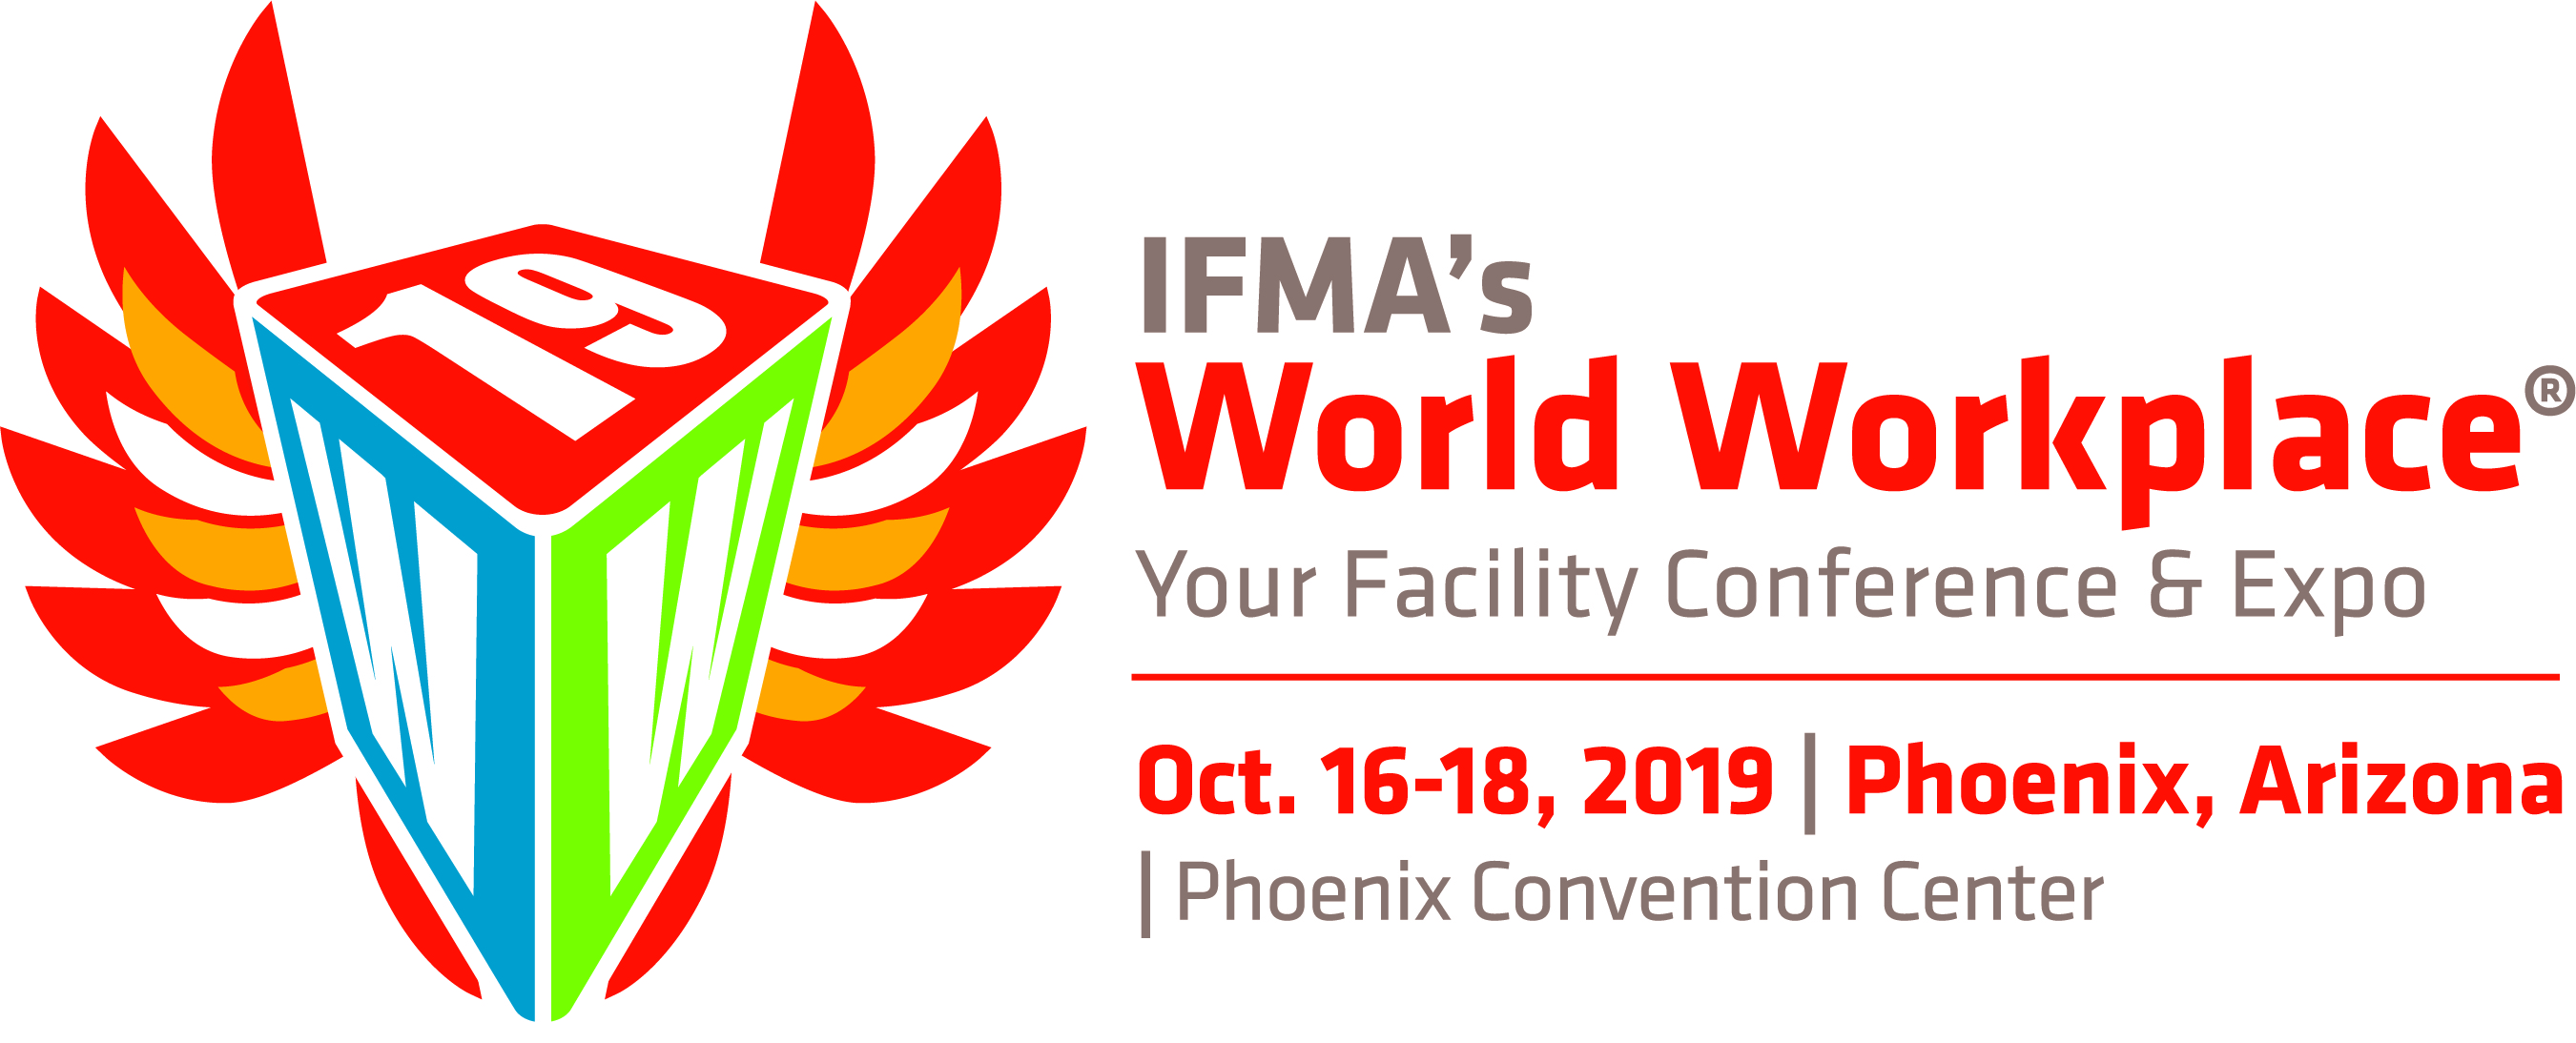 IFMA's World Workplace 2019